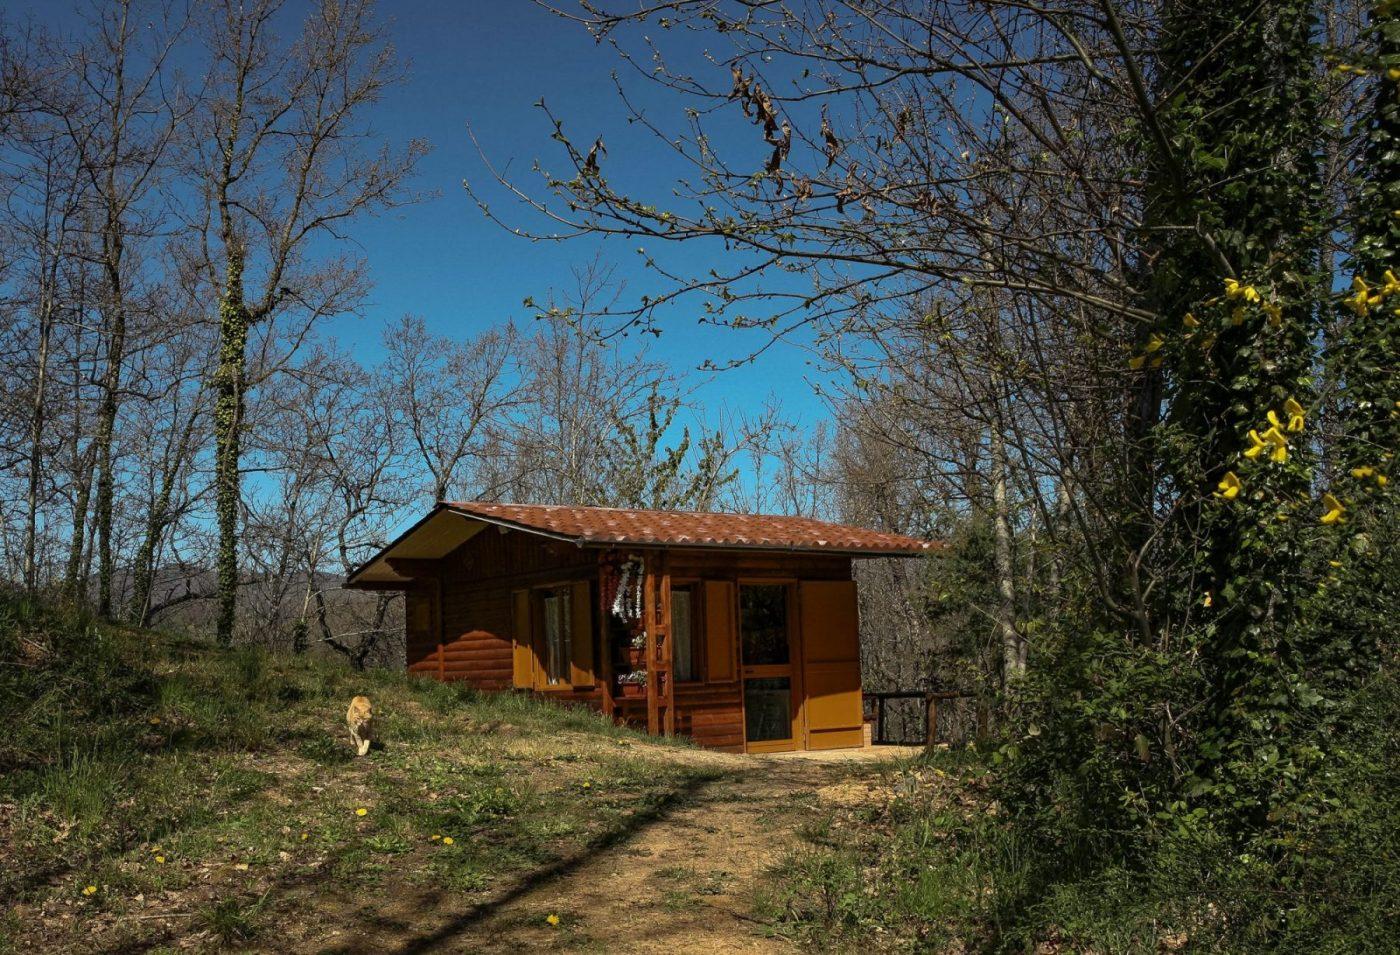 Chalet nel bosco Calabria - Esterno